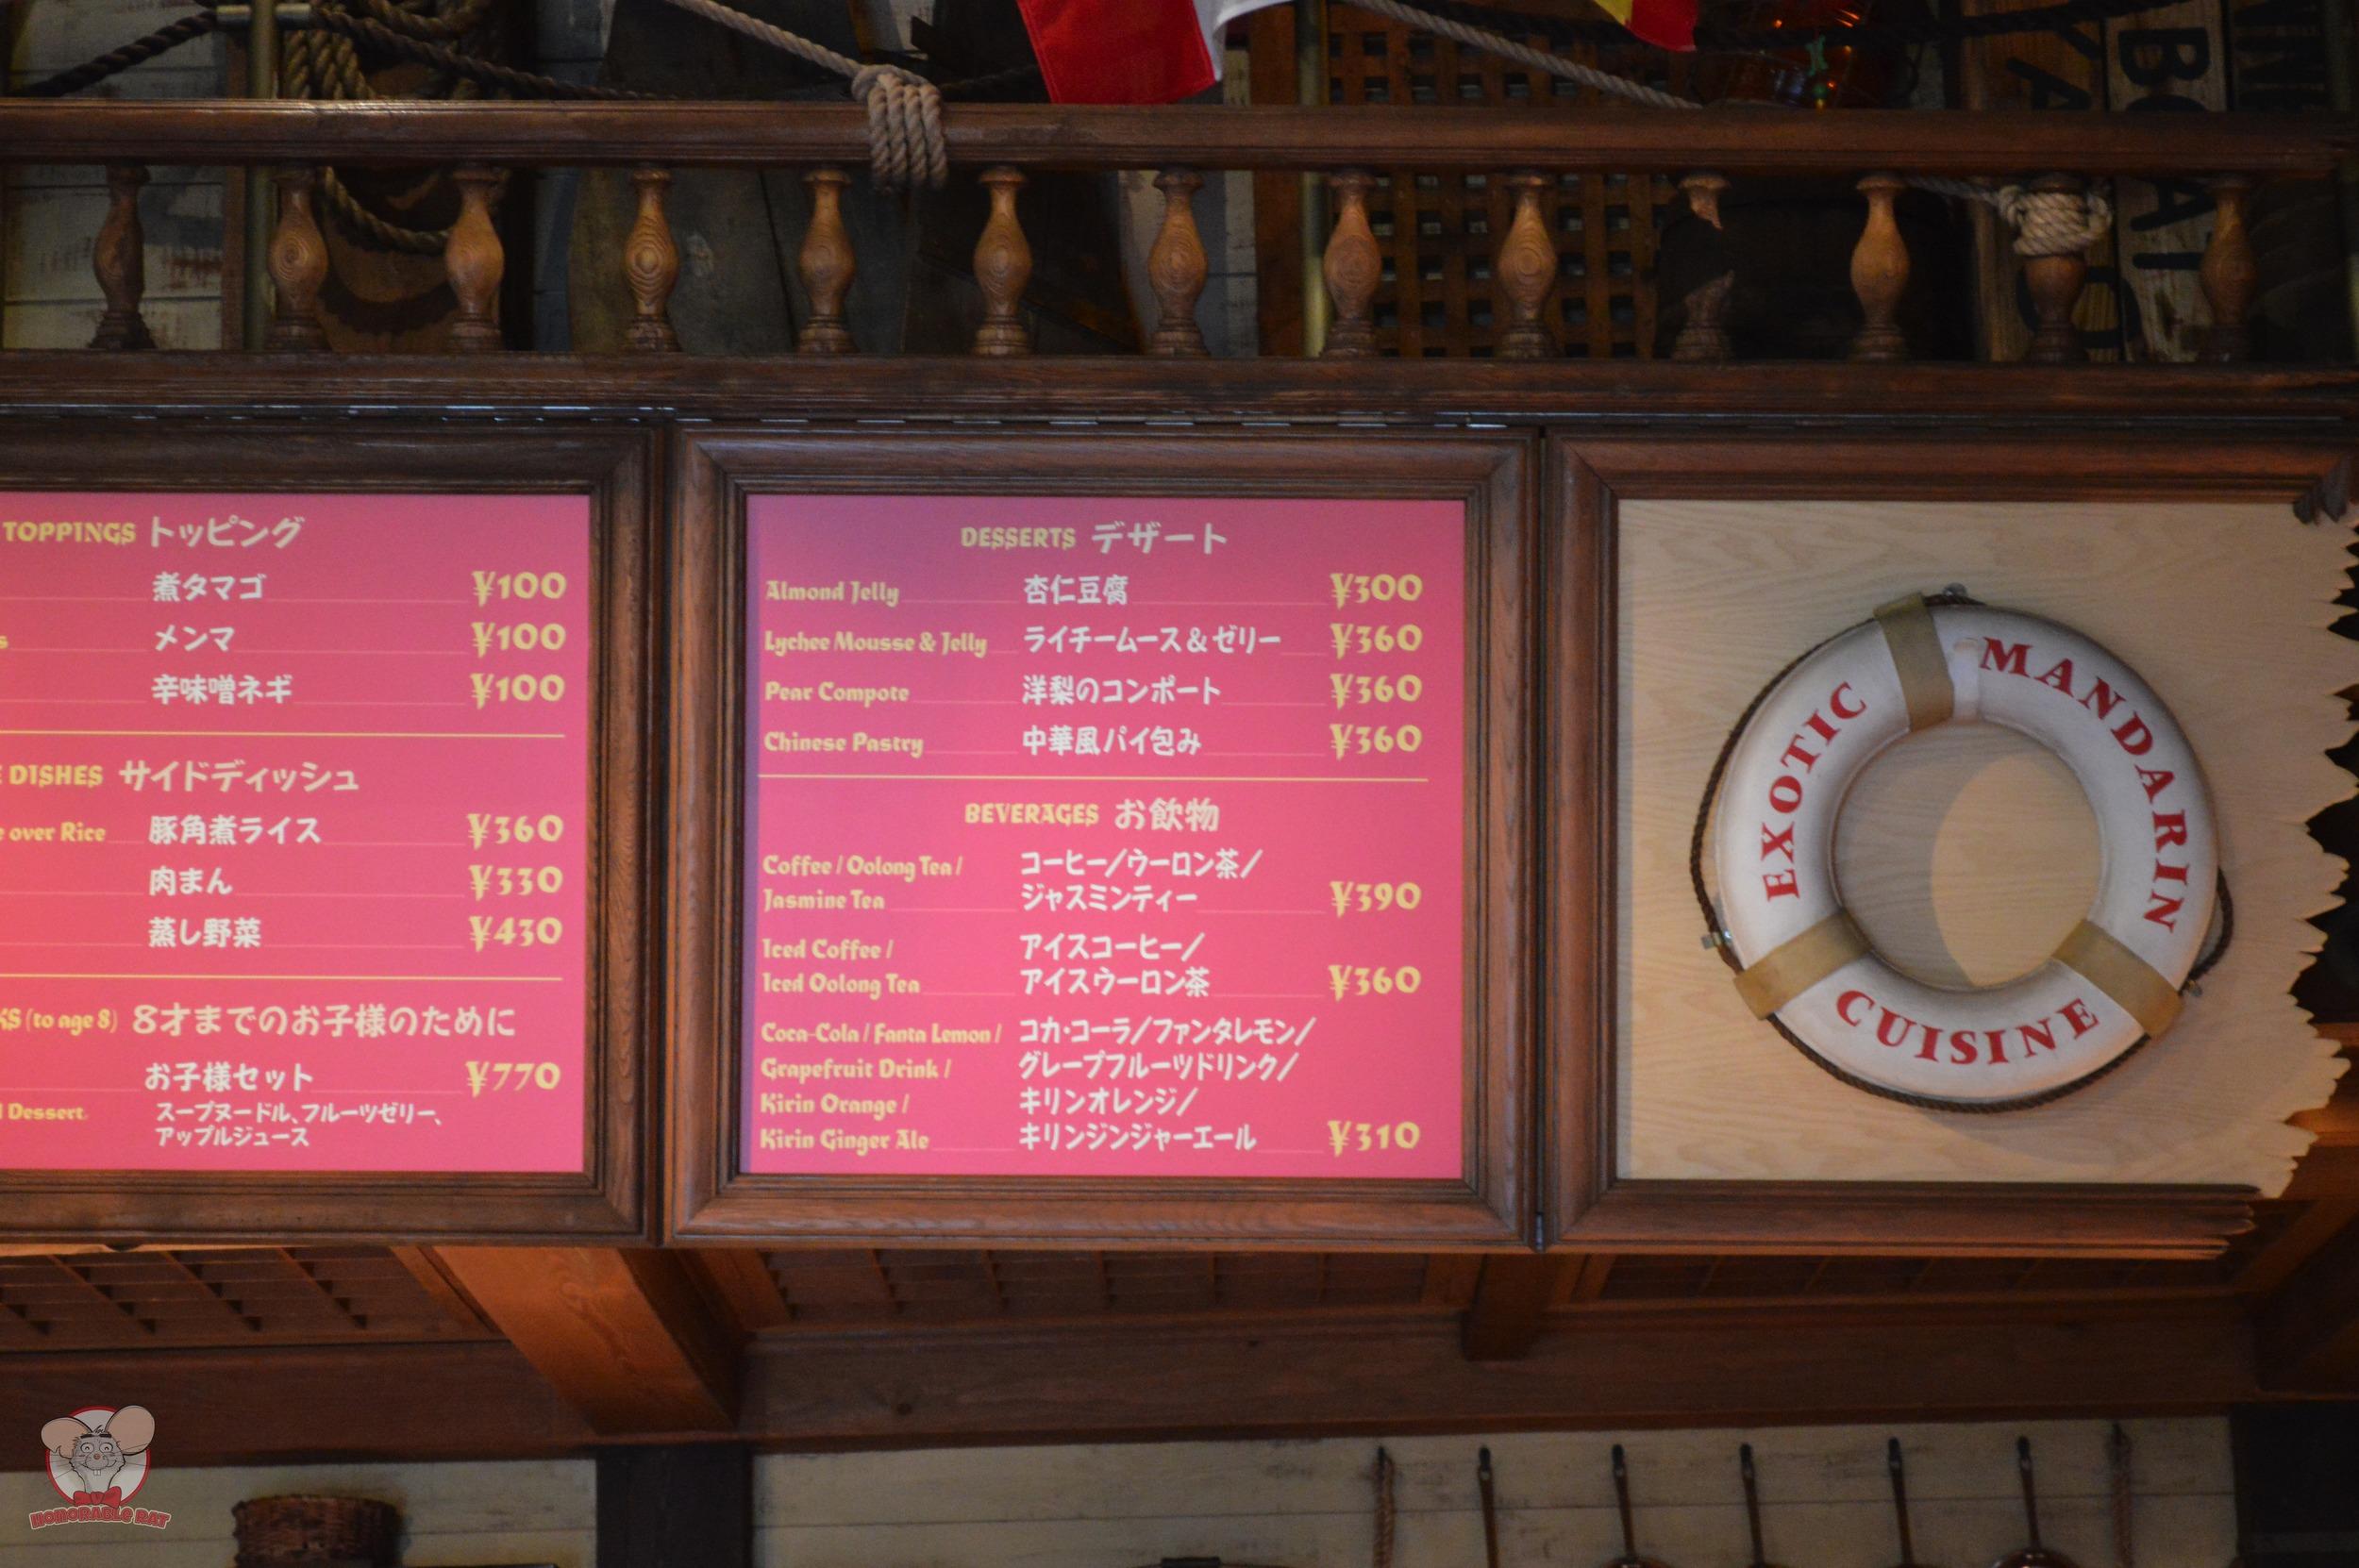 390 yen for a tea bag?!